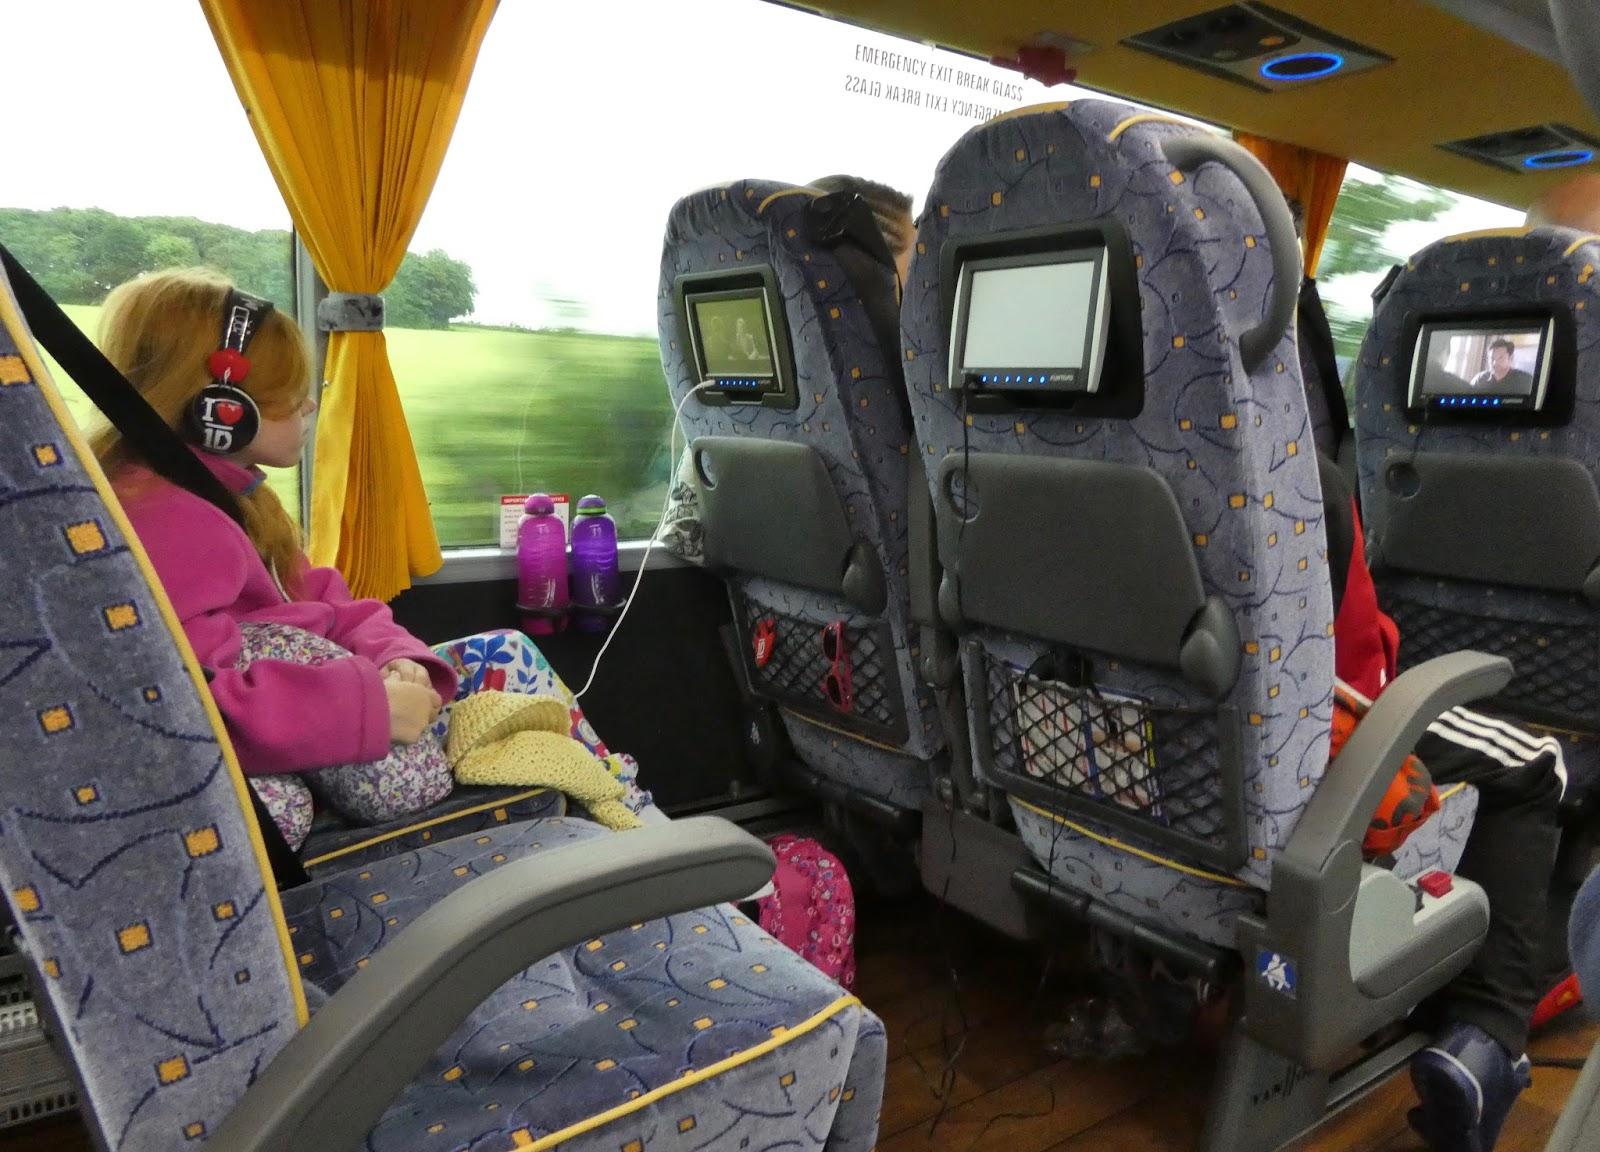 Camping La Siesta, Calella de Palafrugell, Costa Brava - a review - Siesta Holidays Bus